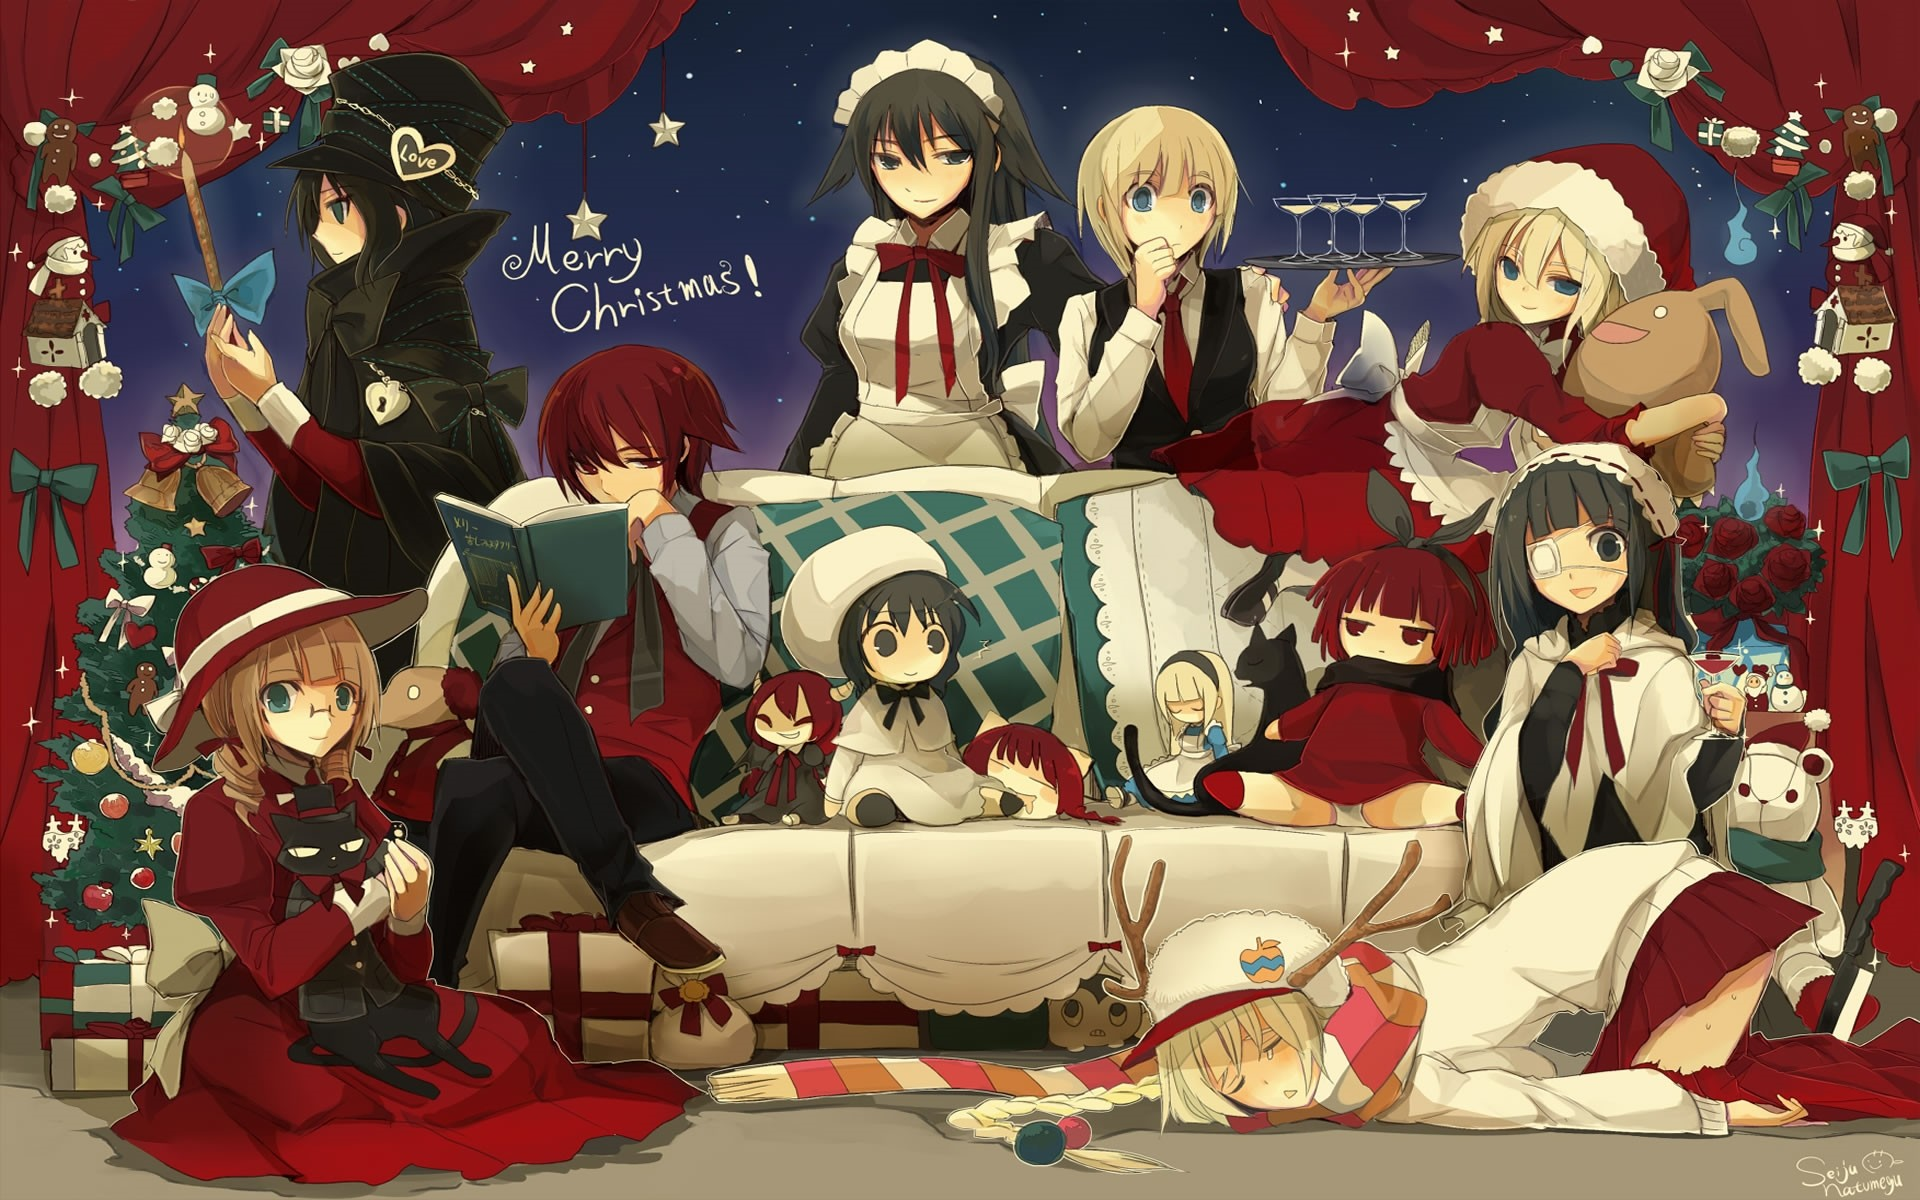 … HD Wallpaper Desktop Background Anime Christmas Wallpaper merry christmas  anime wallpaper …